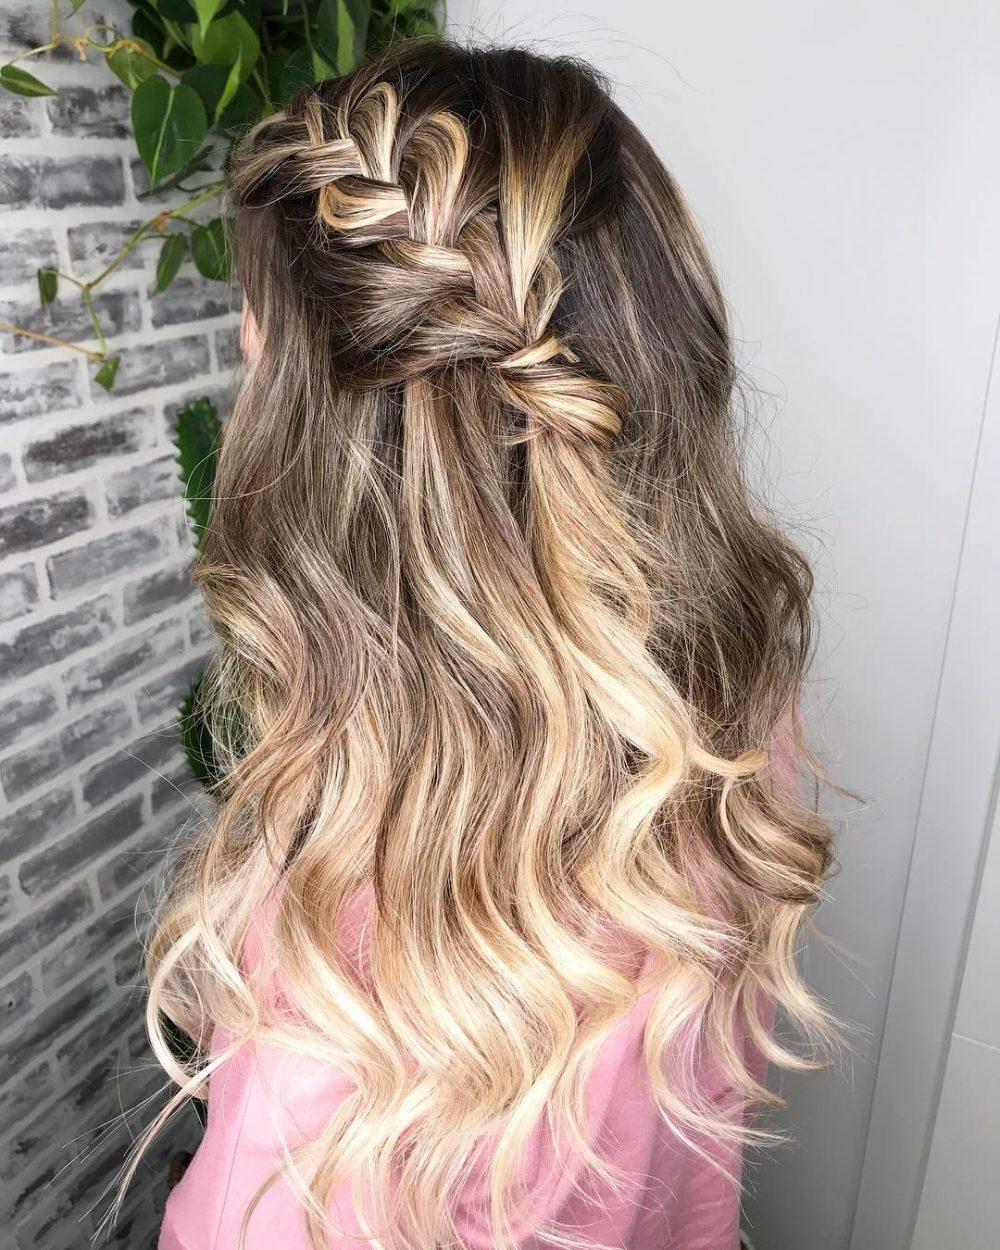 Beachy Babe hairstyle